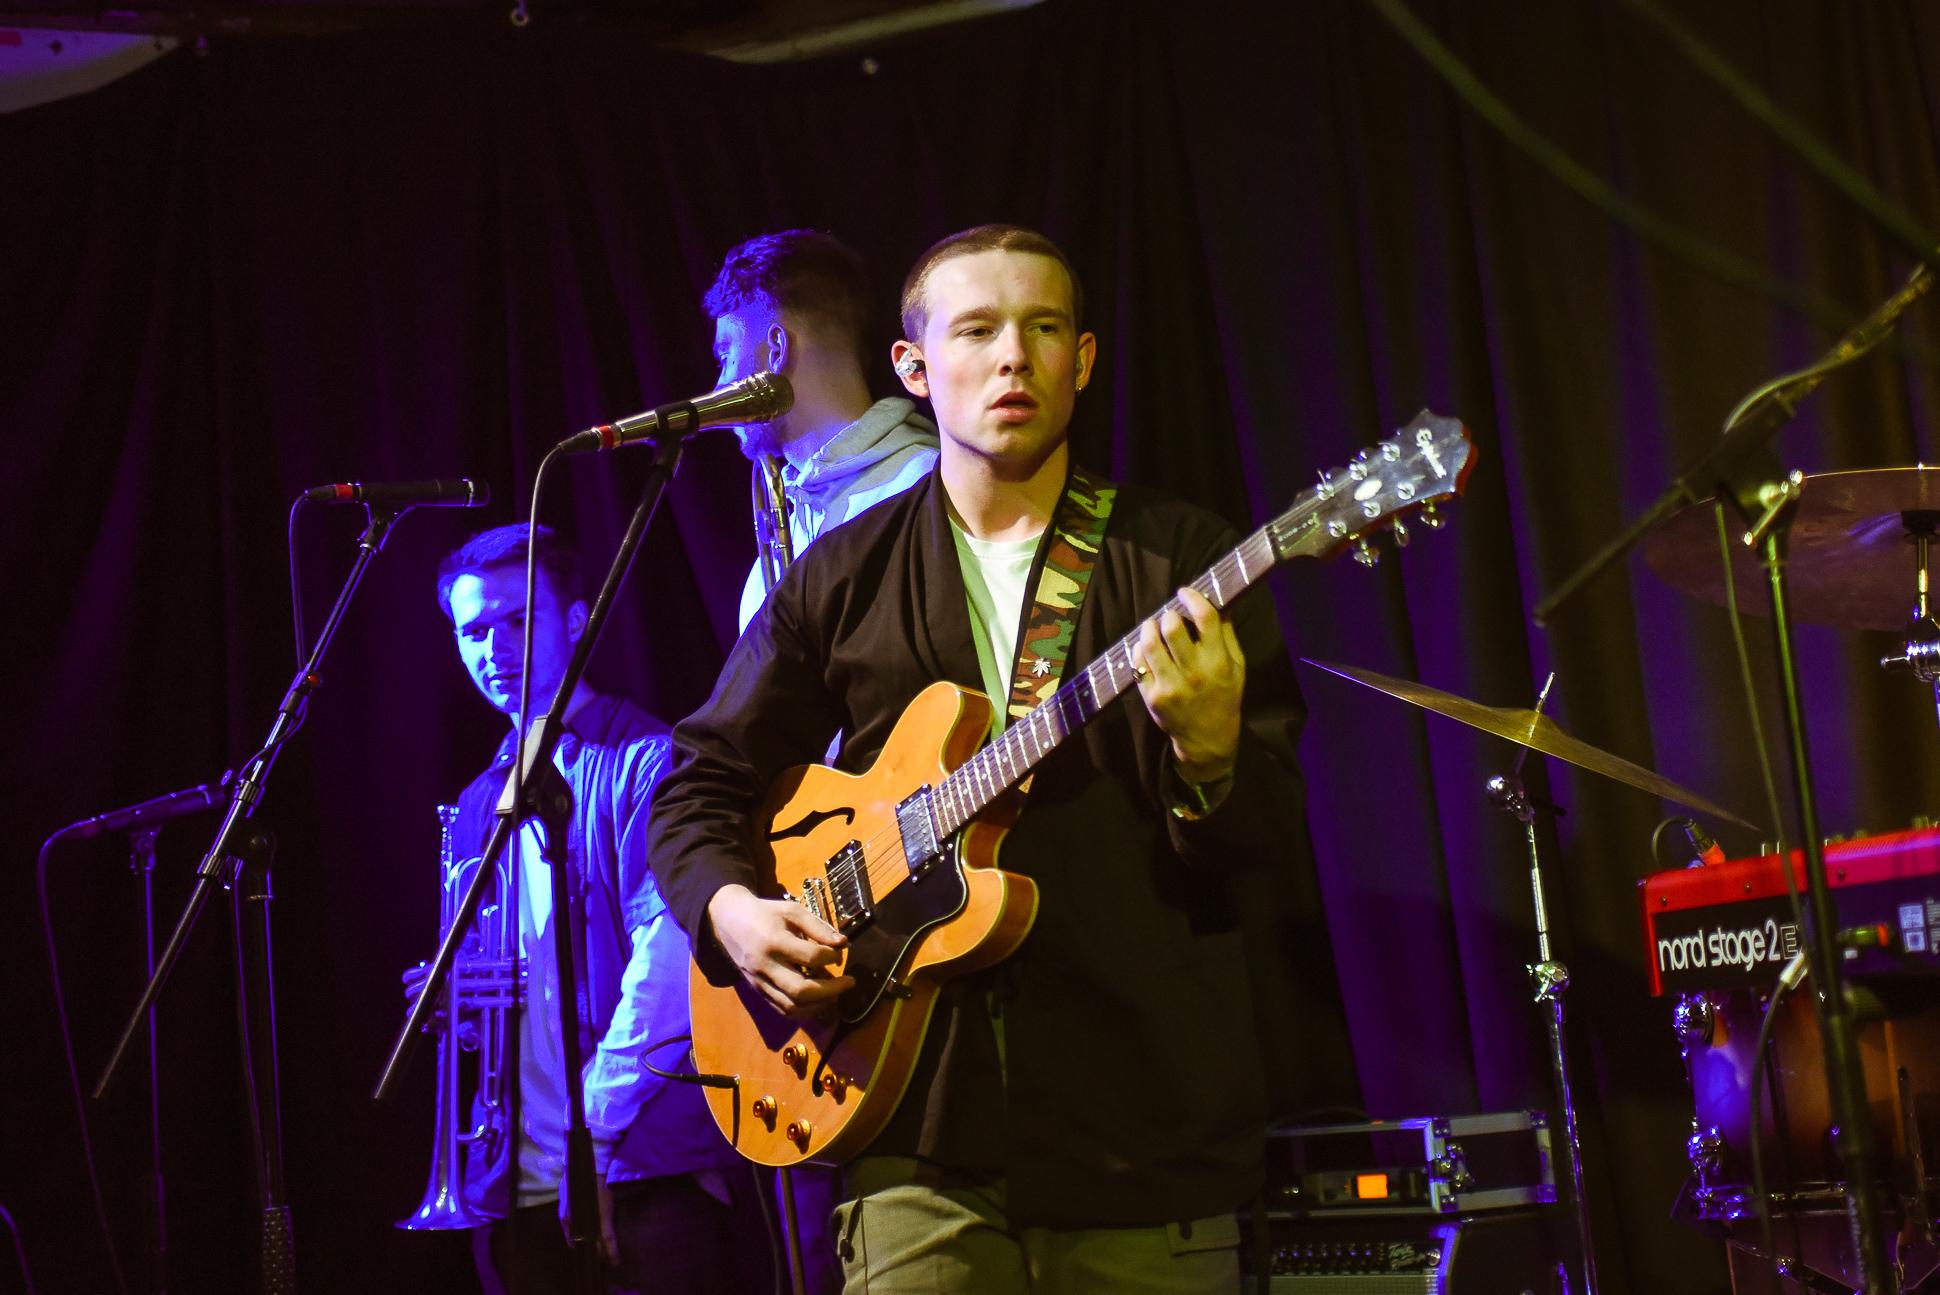 Live At Leeds 2019 - VC Pines-5.jpg